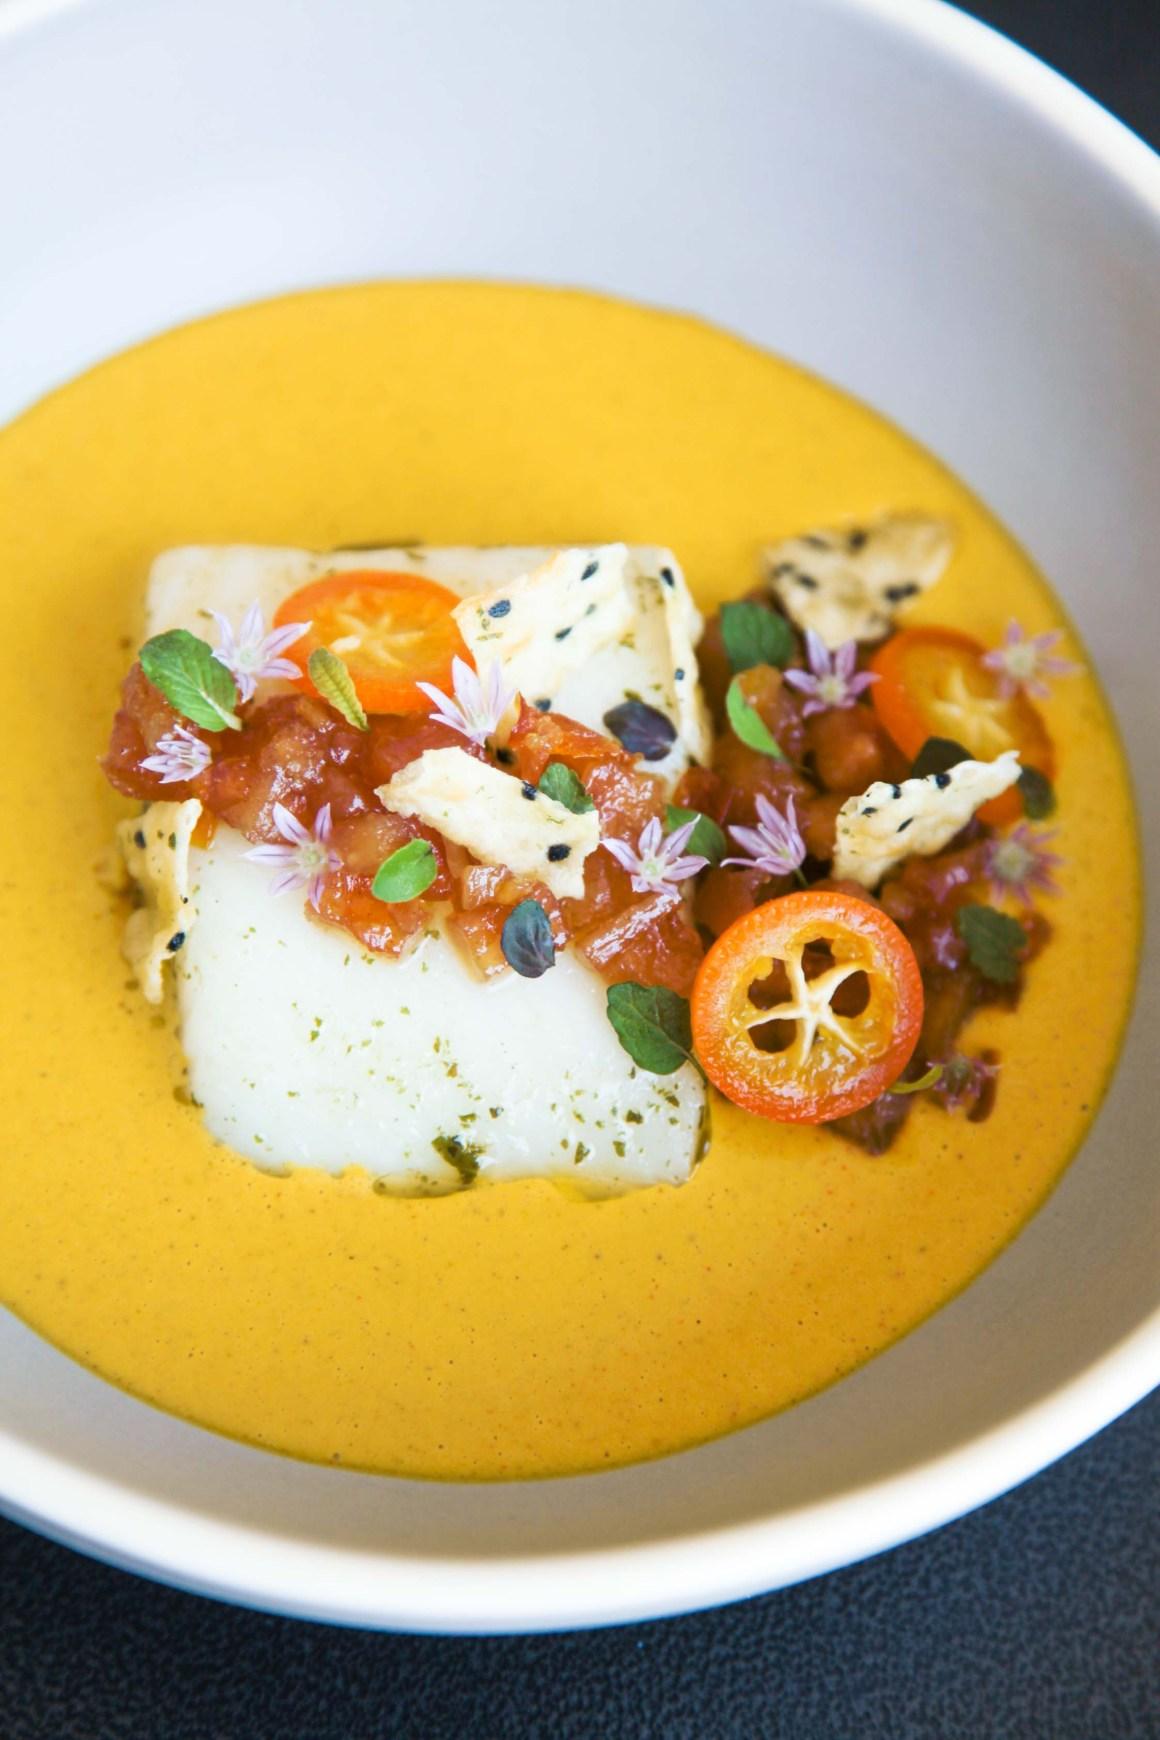 Exquisite halibut, lemon verbena, golden curry, quince and kumquat   Berries and Spice